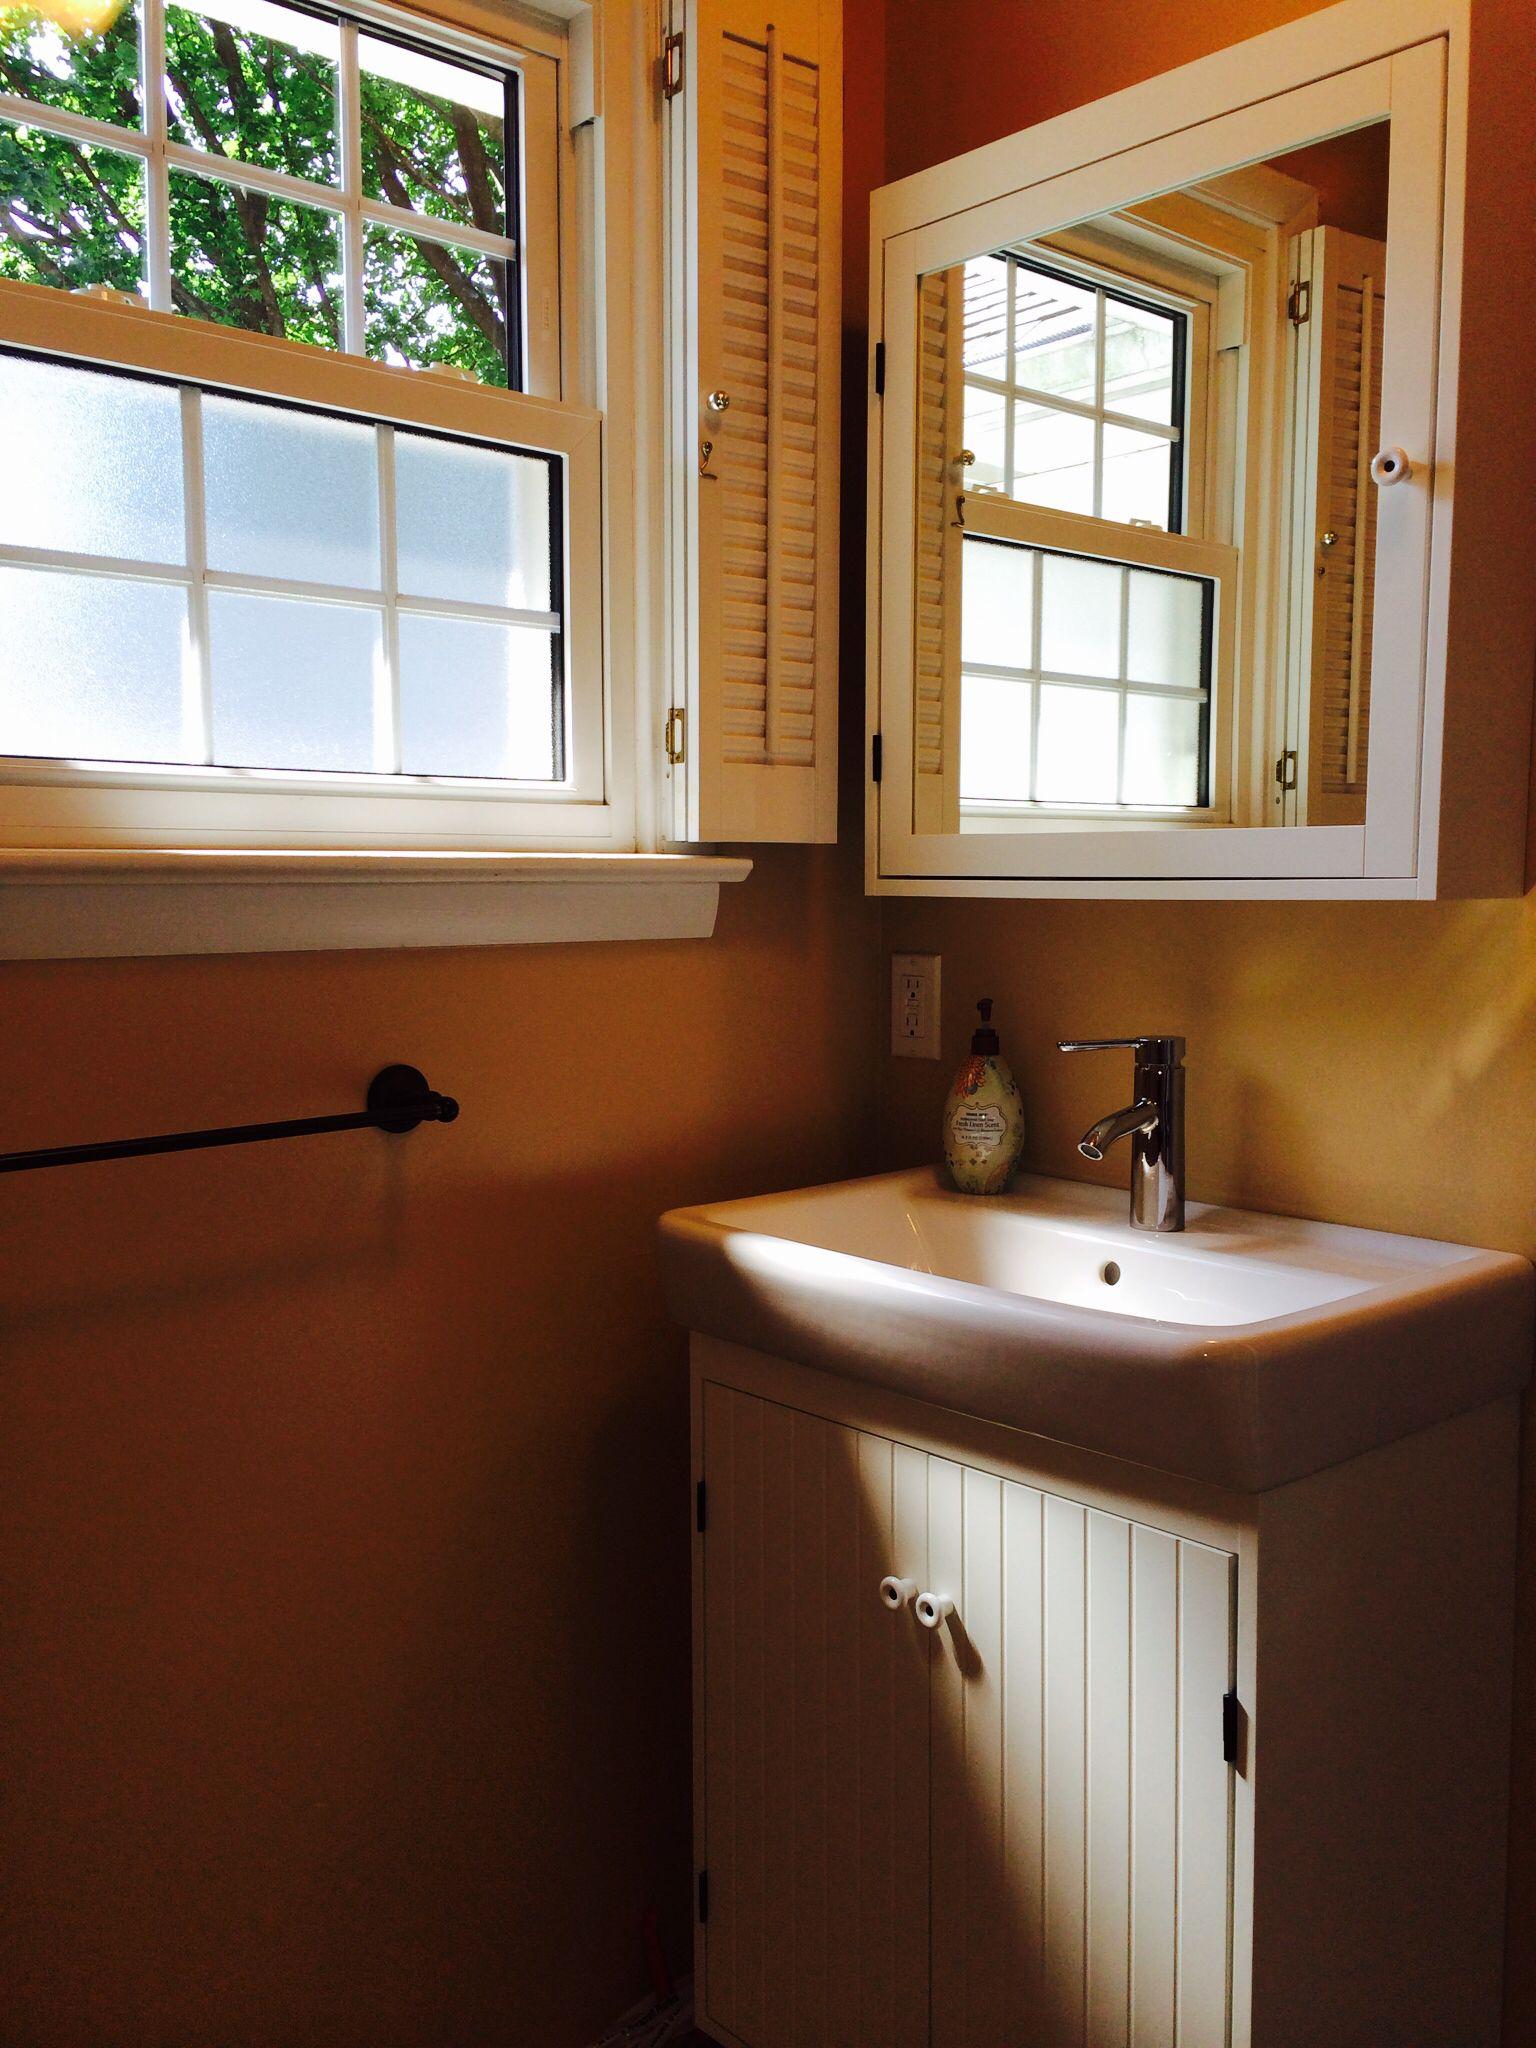 Ikea bathroom Hamnviken sink Silveran sink cabinet Dalskar faucet & Silveran mirror cabinet